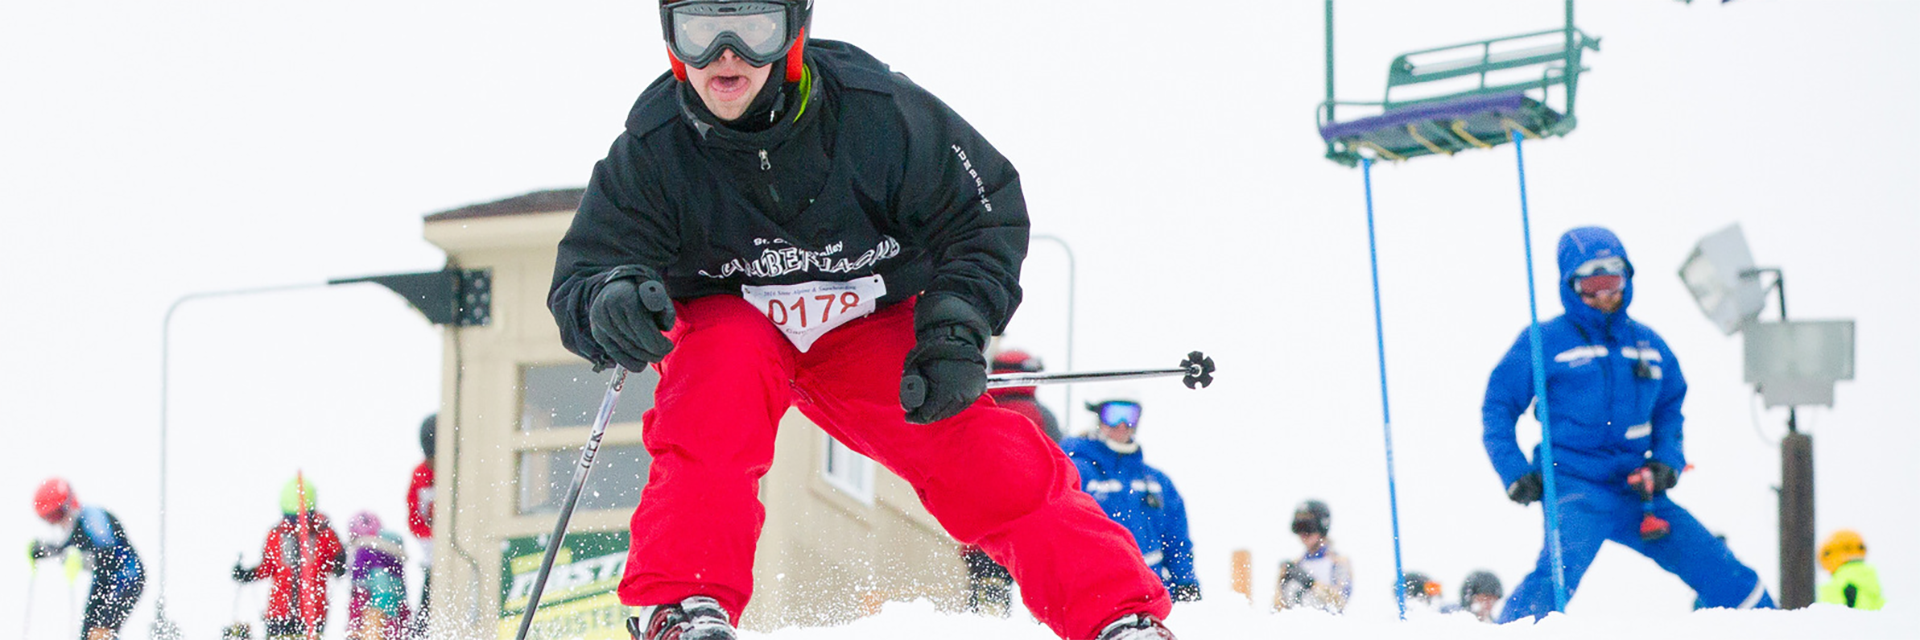 Special Olympics Minnesota alpine skier skiing down hill